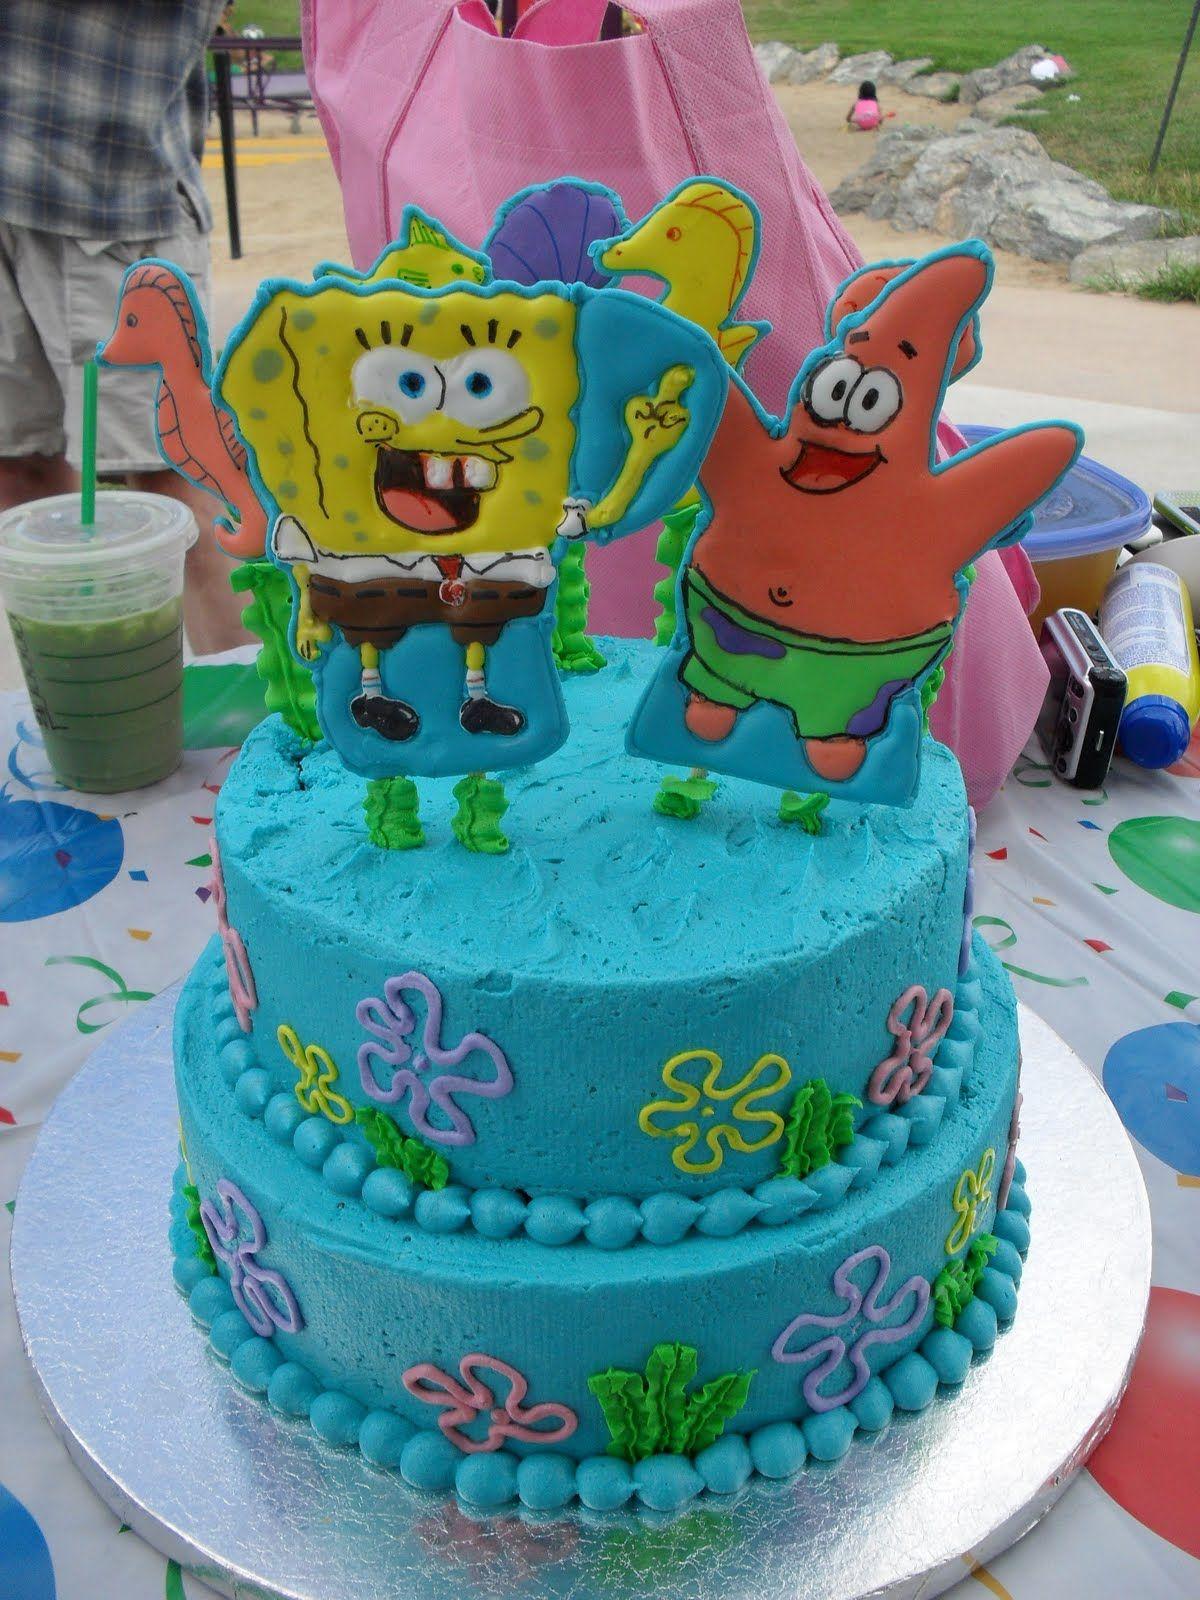 spongebob squarepants cakes Behold the Spongebob Squarepants cake